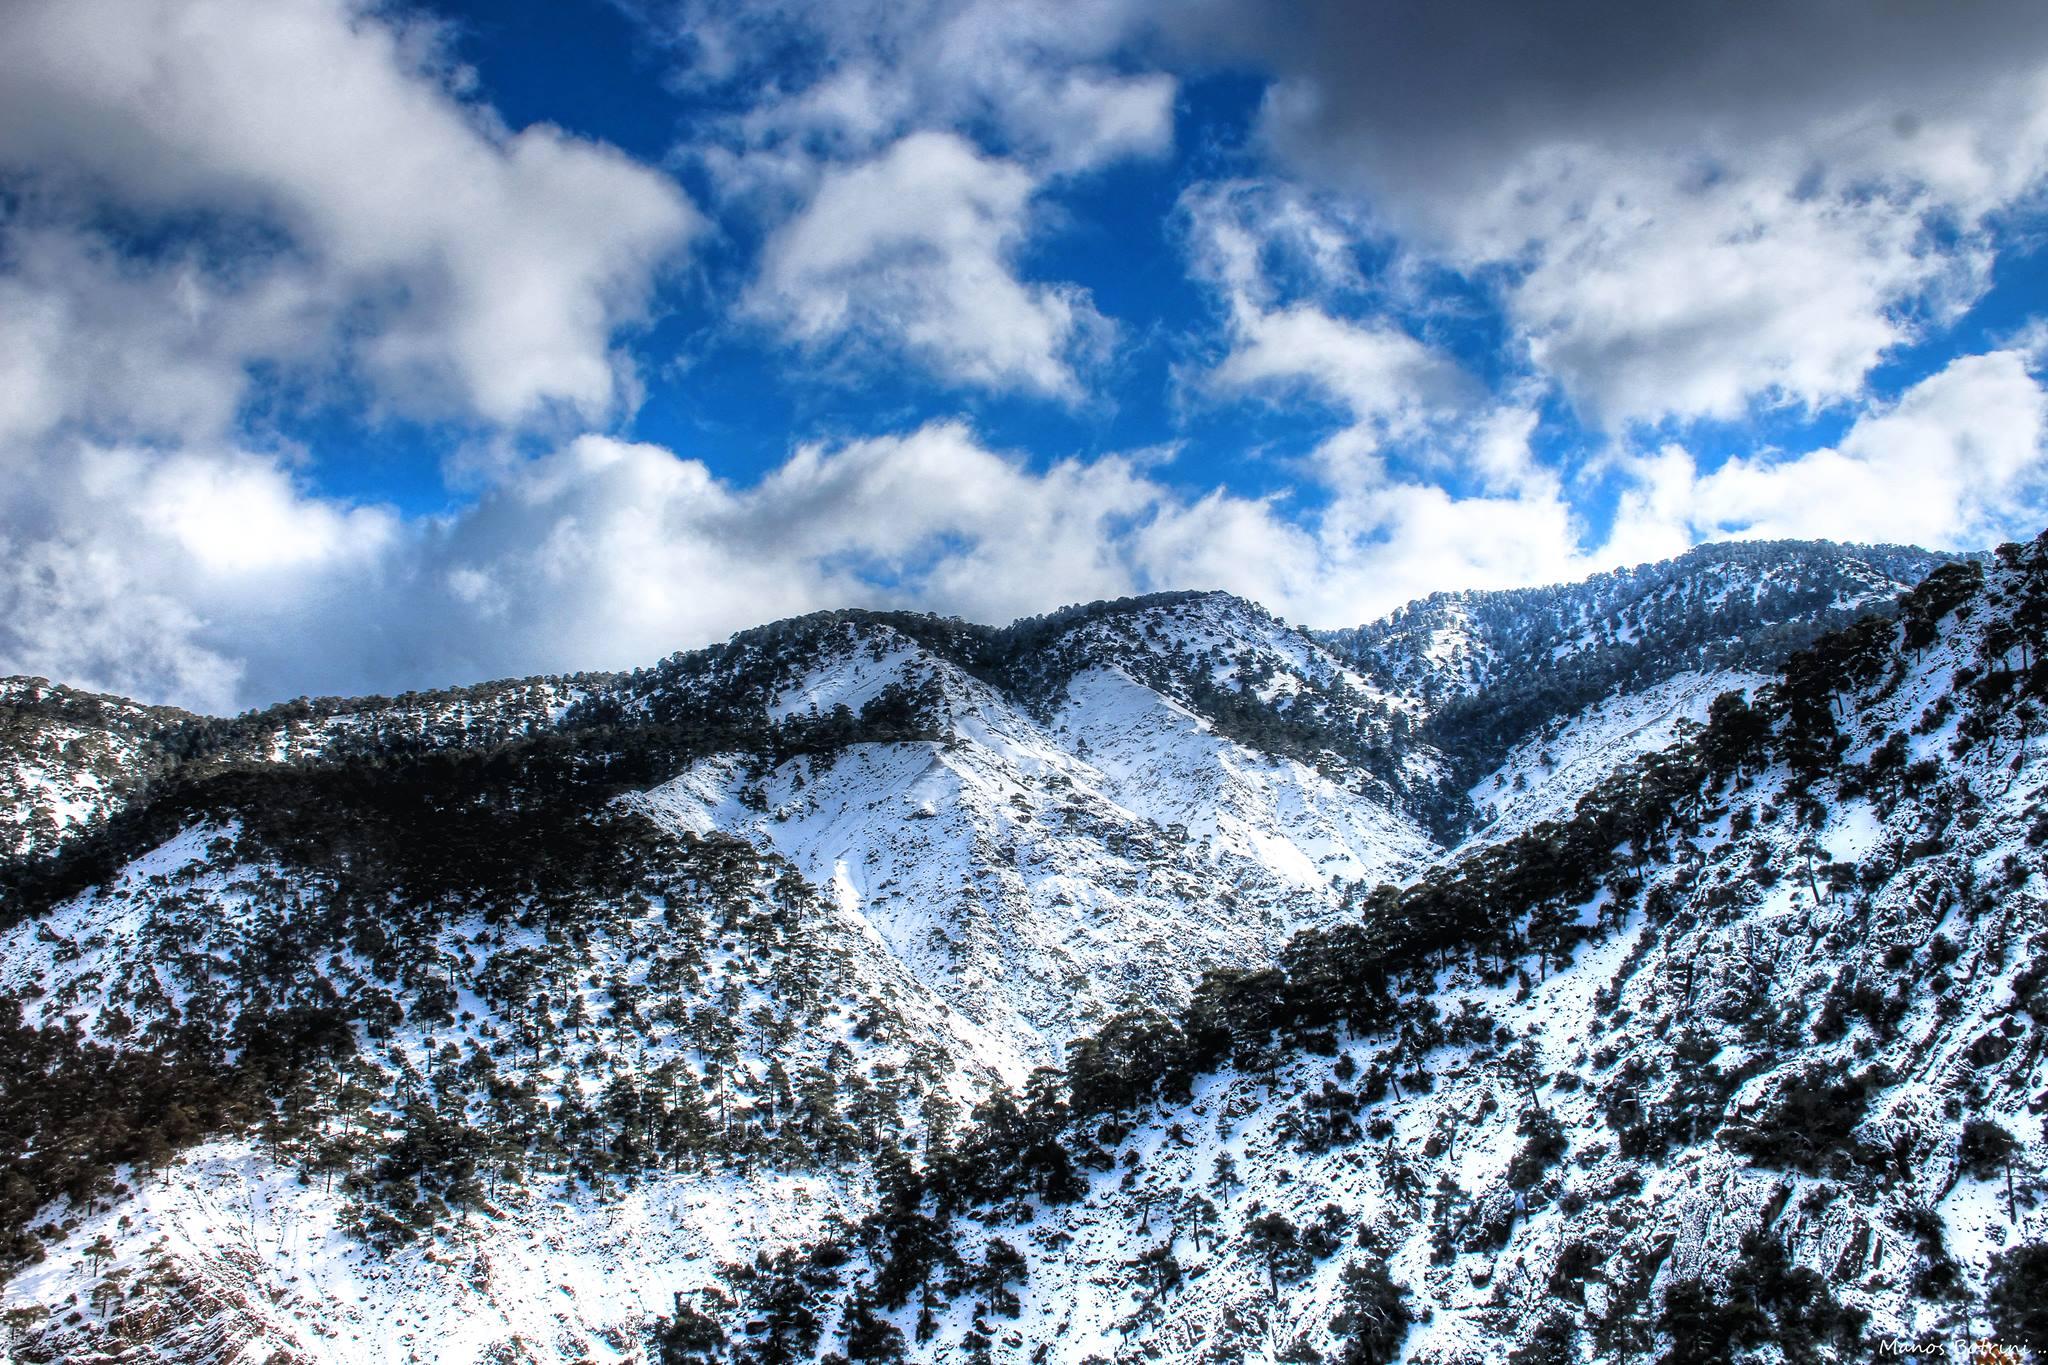 Trodos'tan Kar Manzaraları galerisi resim 5